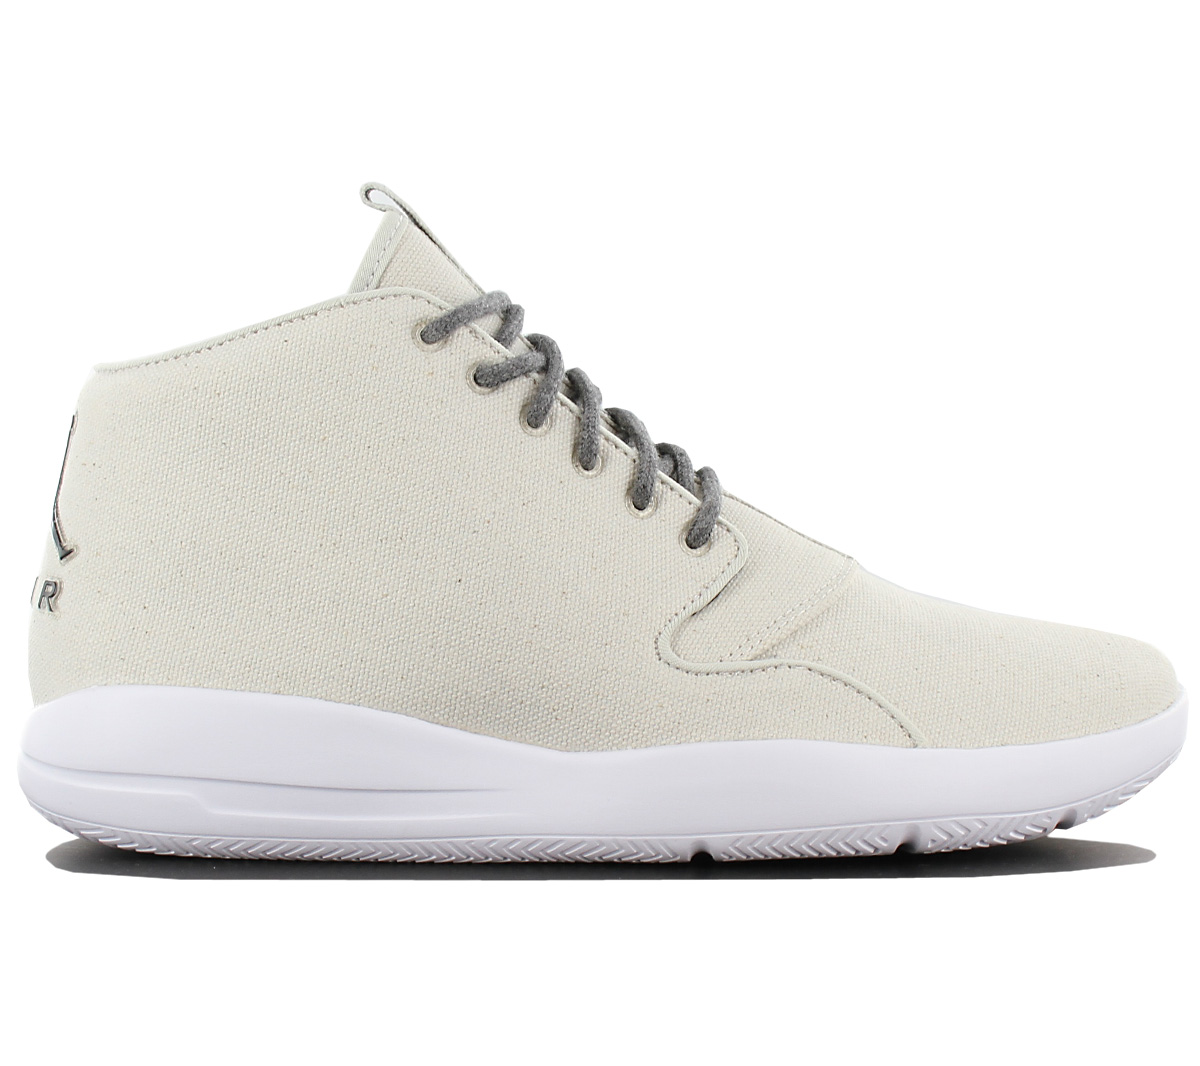 e8baaf6386c Nike Air Jordan Eclipse Chukka Men s Sneakers Basketball Shoes ...